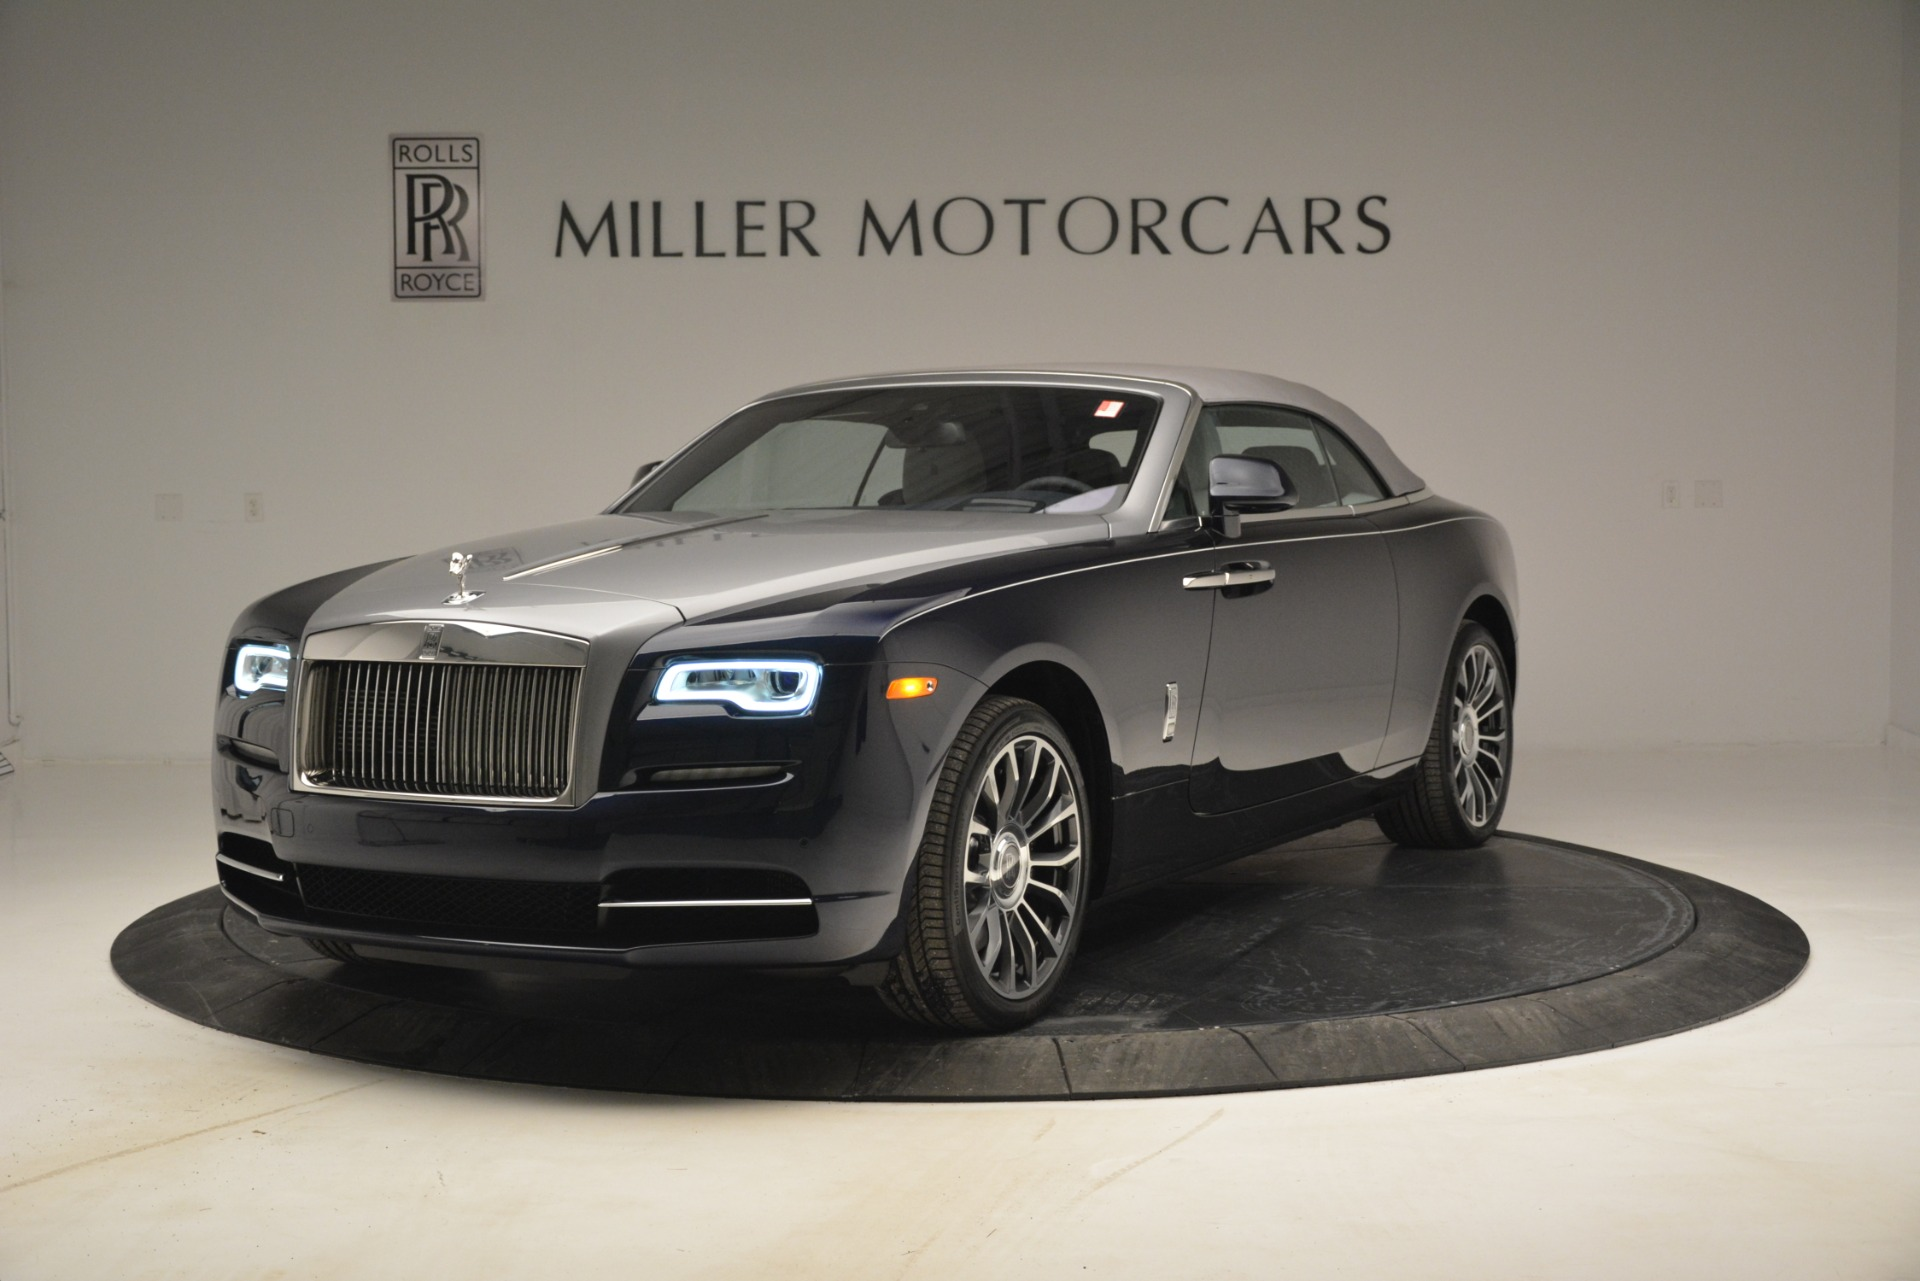 New 2019 Rolls-Royce Dawn  For Sale In Greenwich, CT 2974_p10